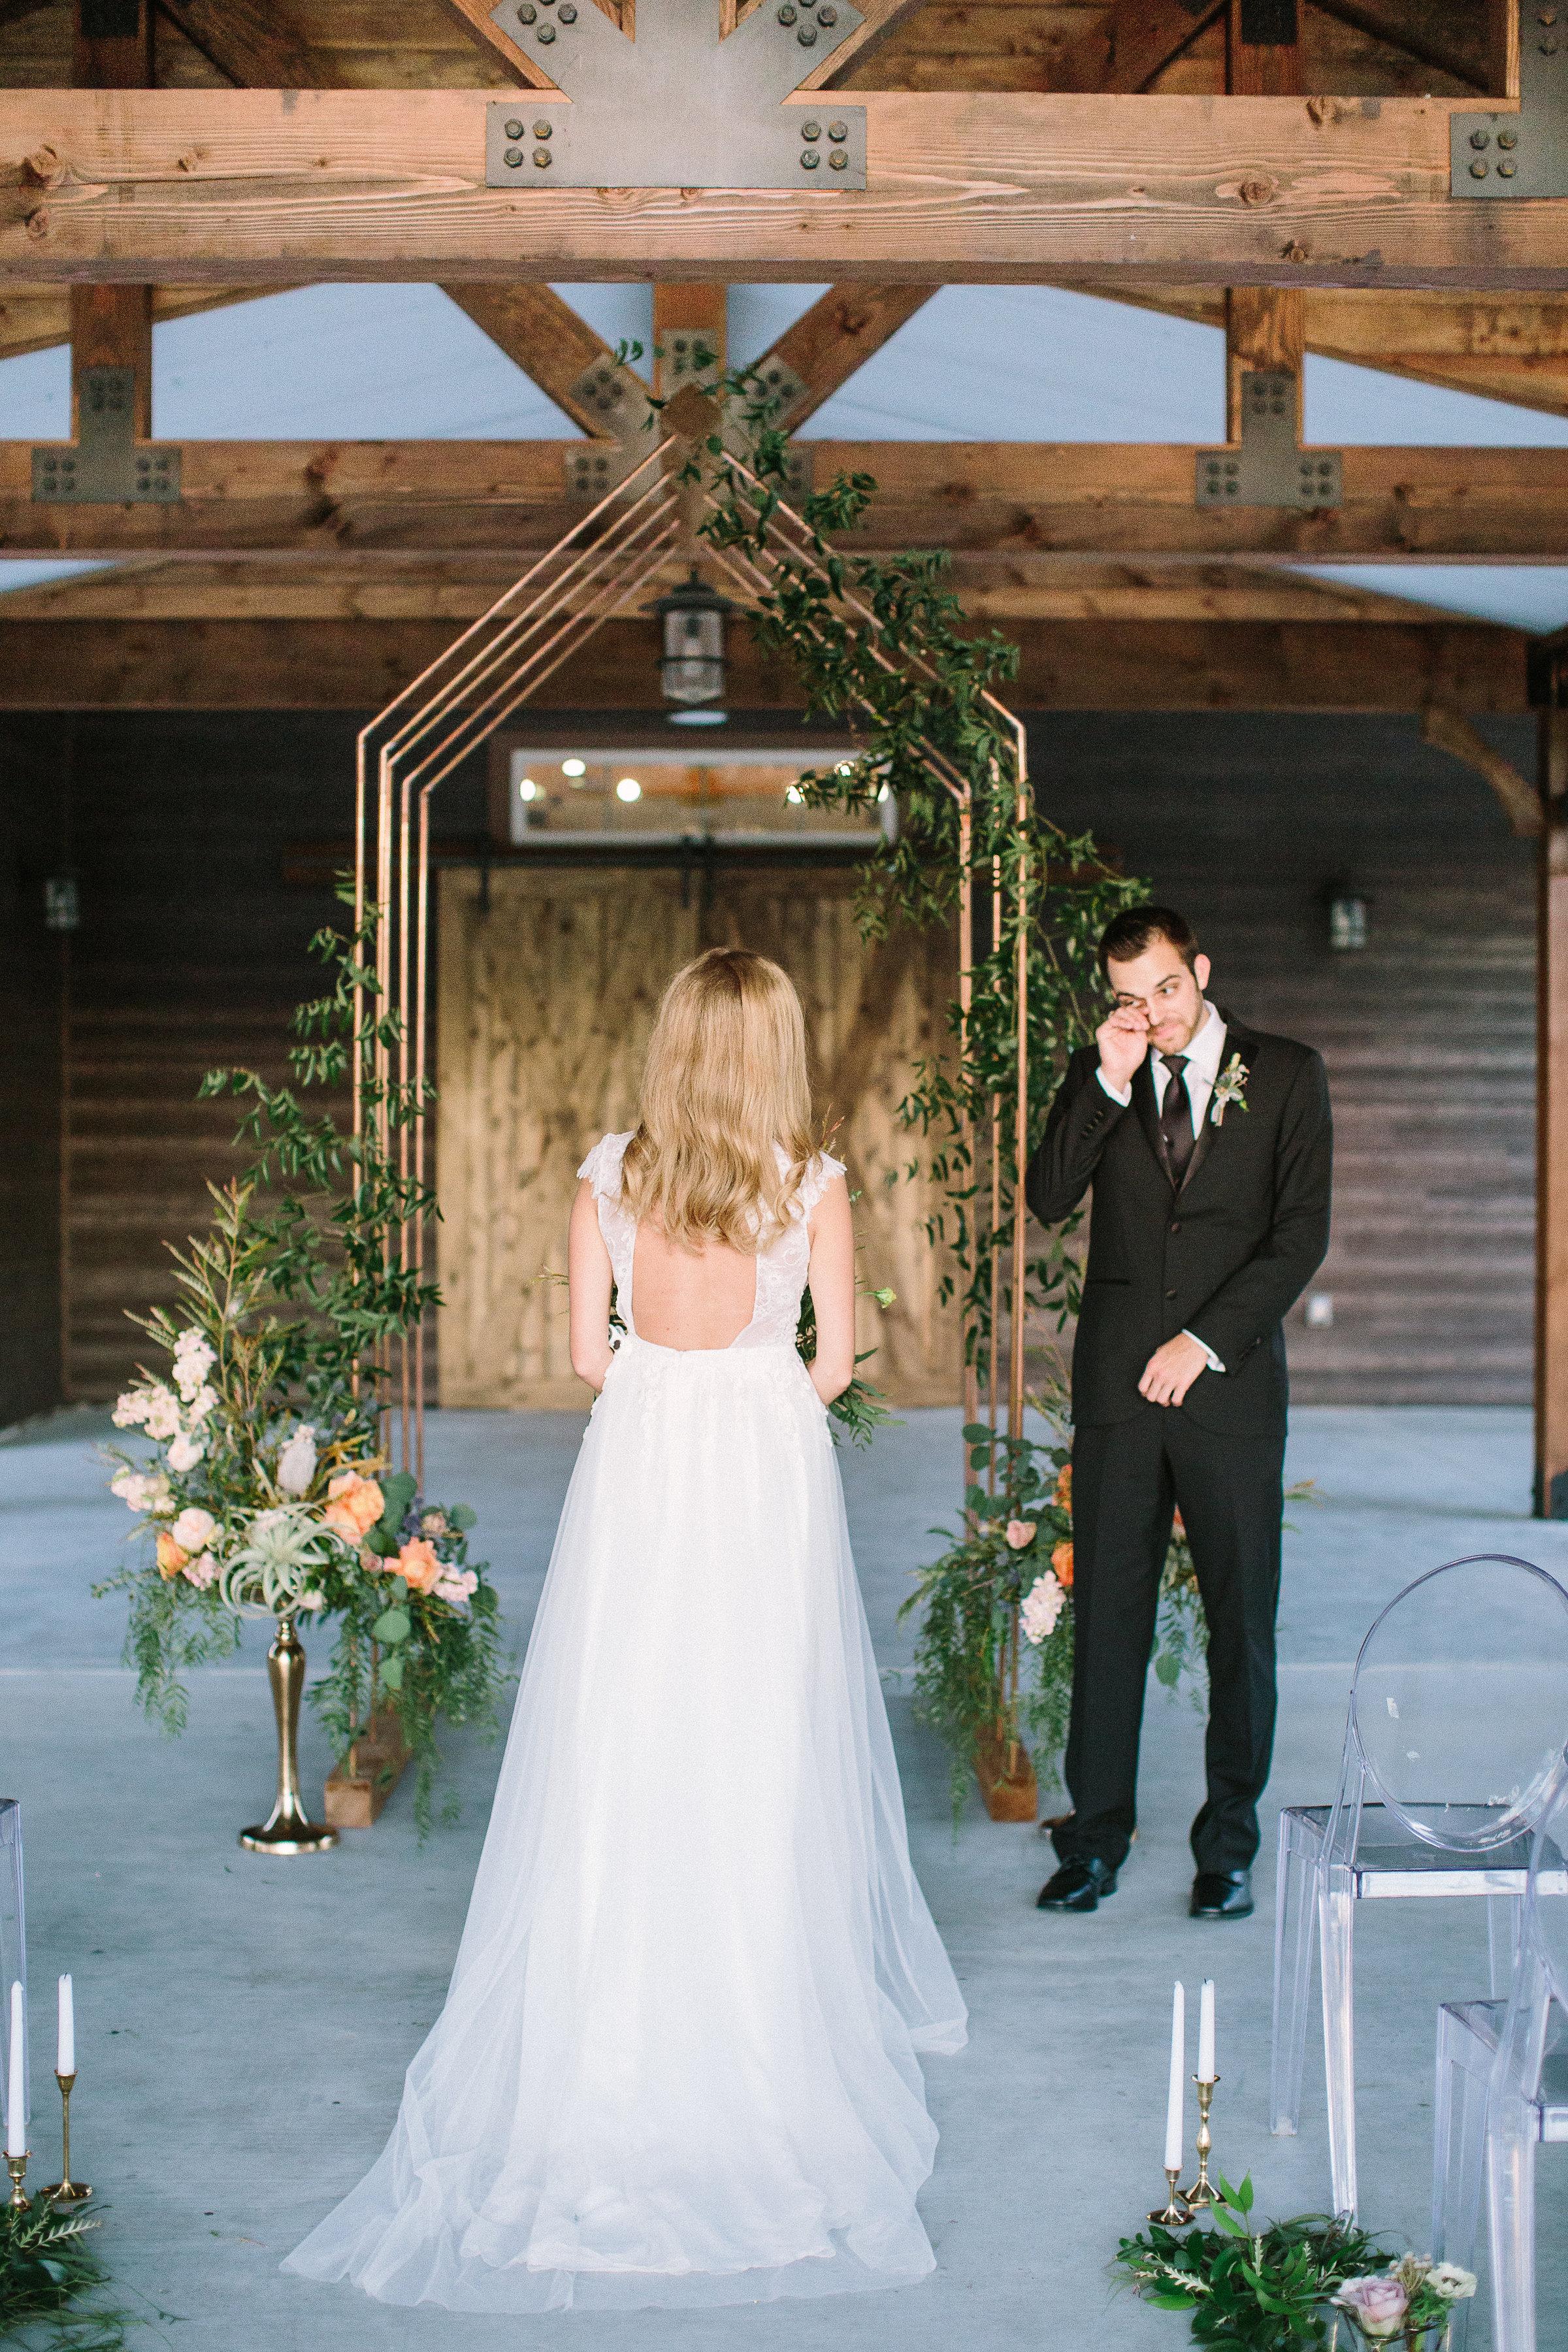 Ellen-Ashton-Photography-Peach-Creek-Ranch-Weddings-Wed-and-Prosper375